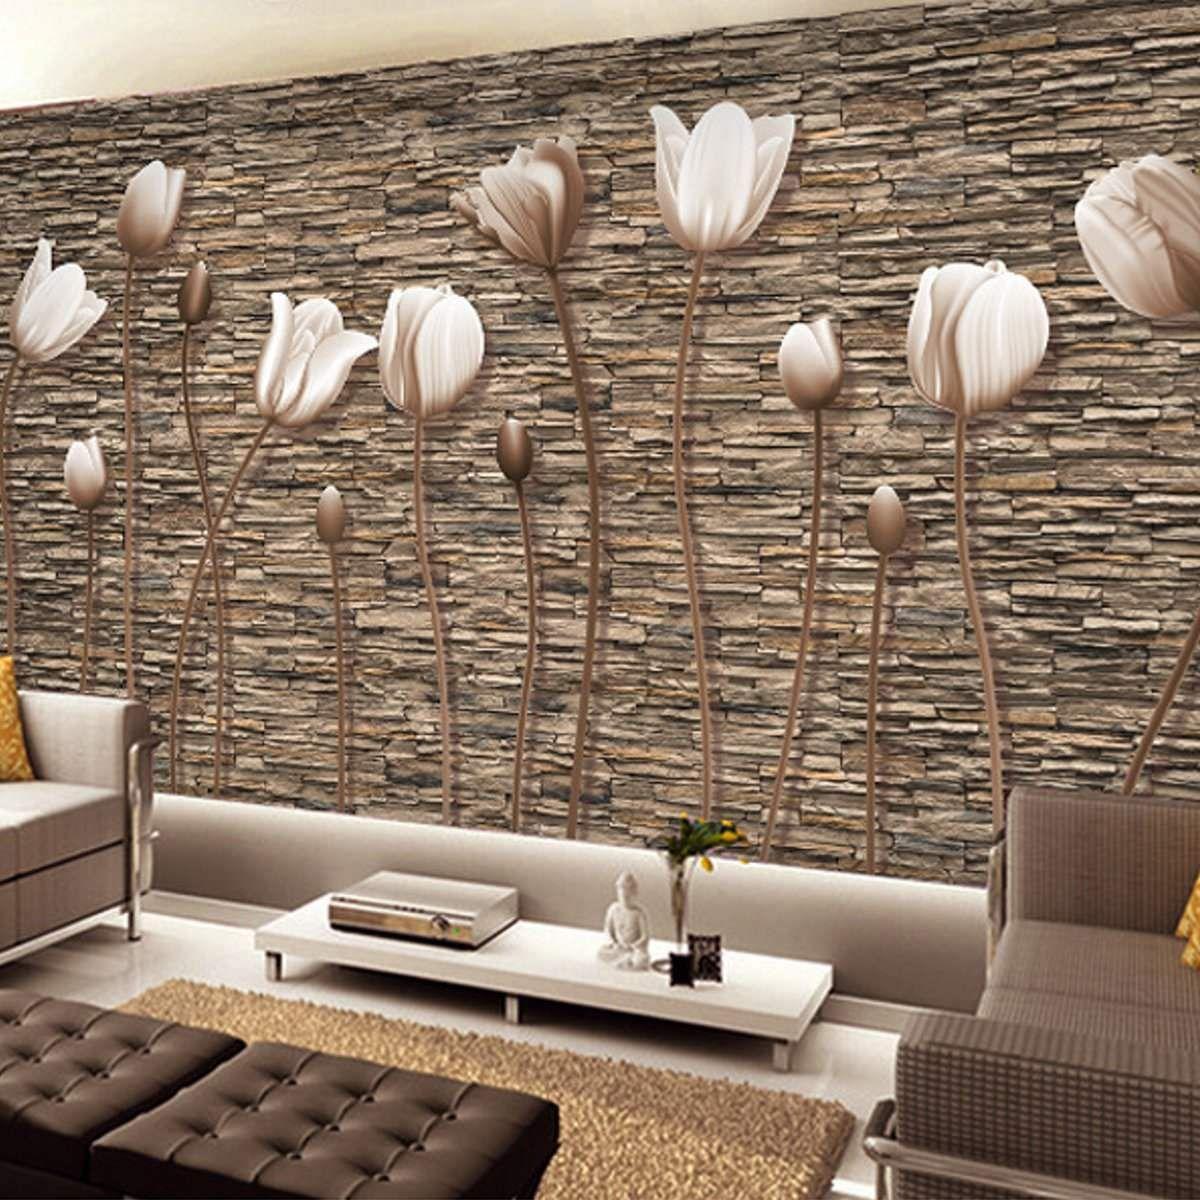 Avikalp Pearl Tulips Photo Wallpaper For Walls 3d Papel De Parede